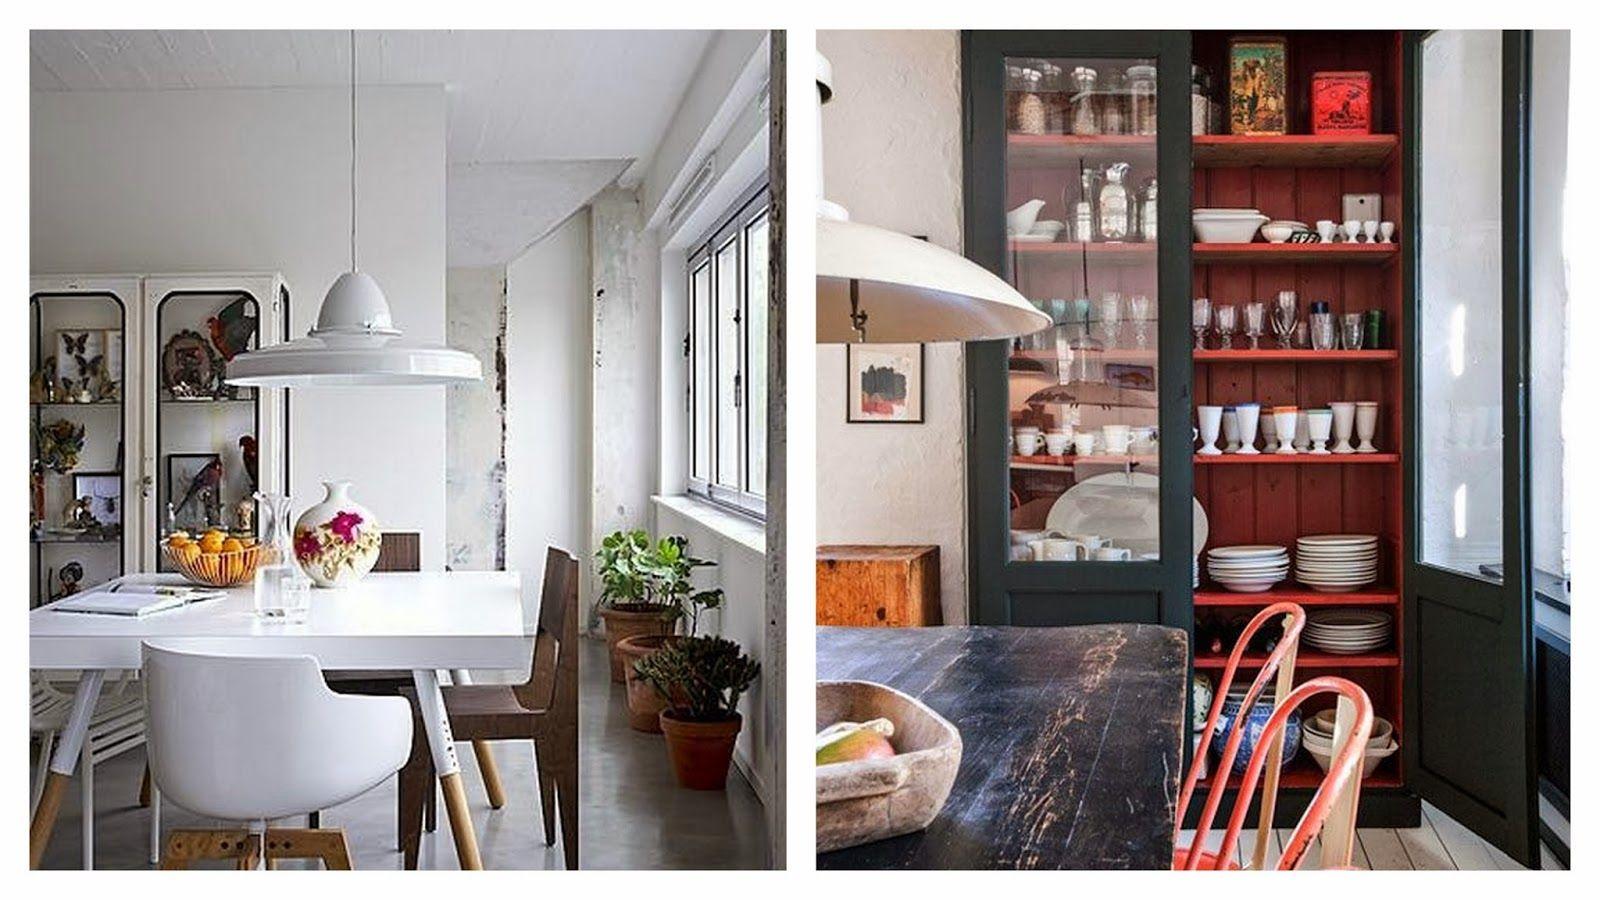 Arredamento Boho Style : Battle of style: scandi versus boho chic blog arredamento